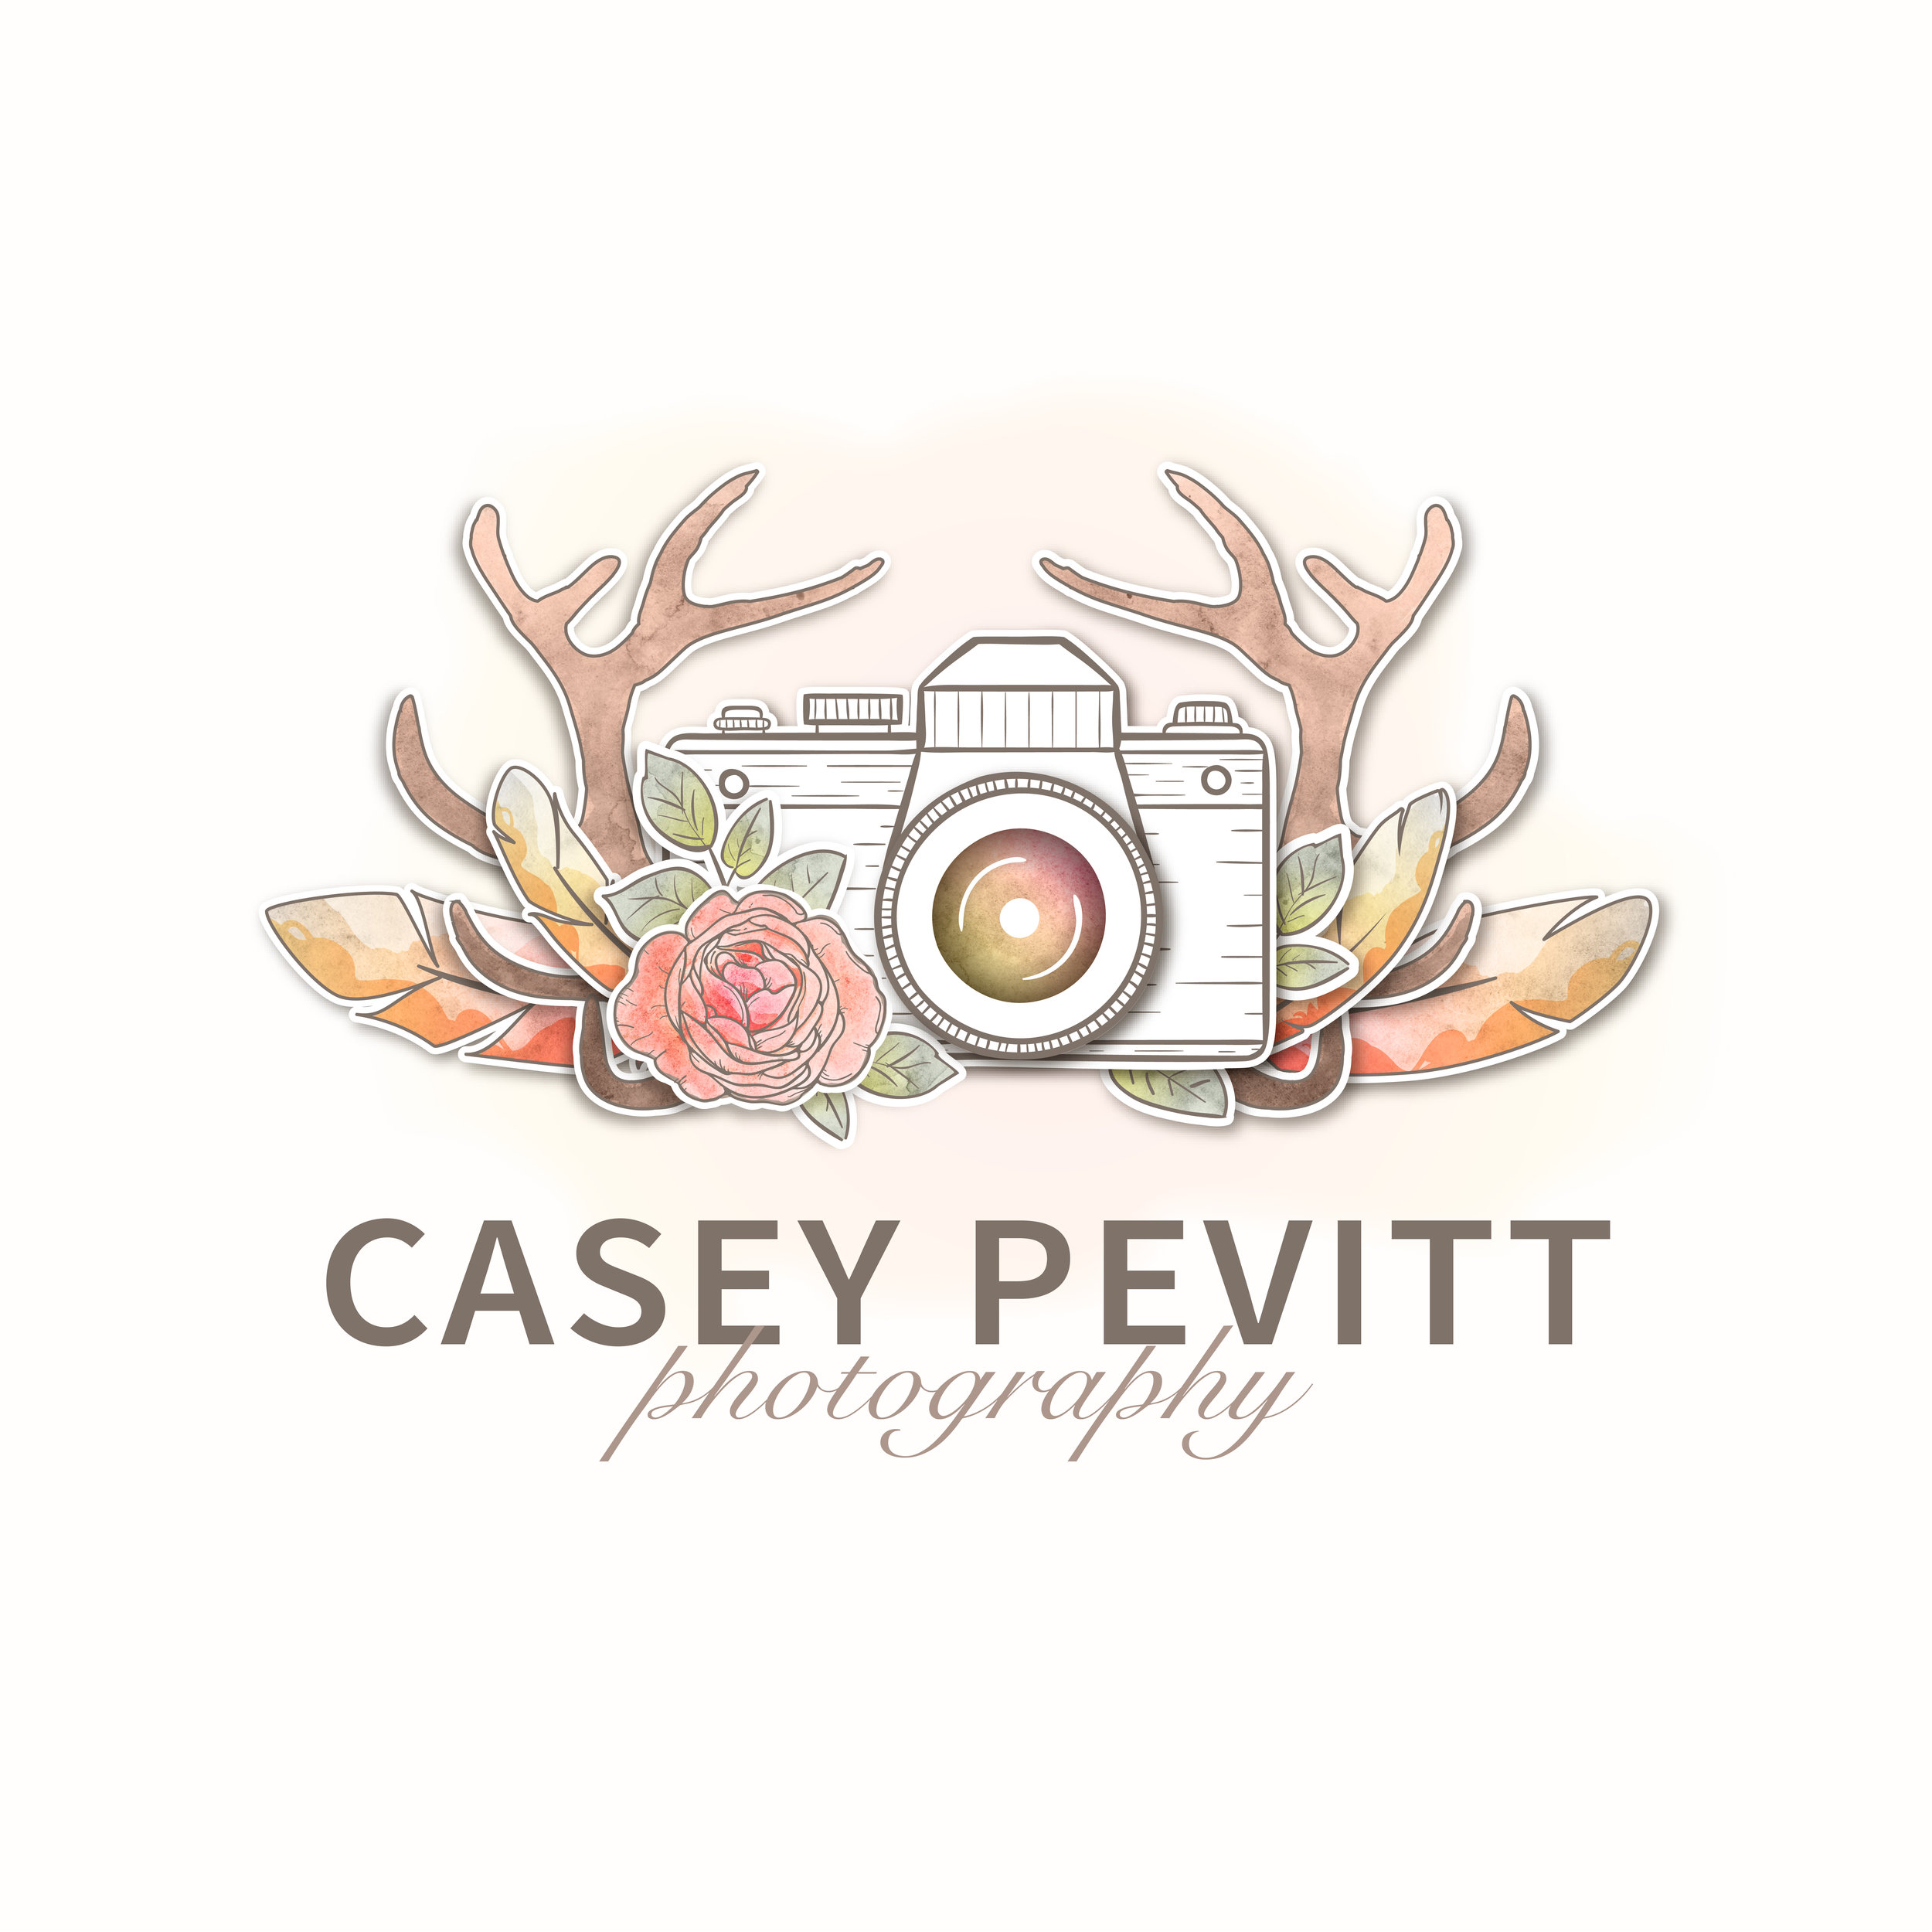 Casey Pevitt Photography | Logo Design by Corinne Jade